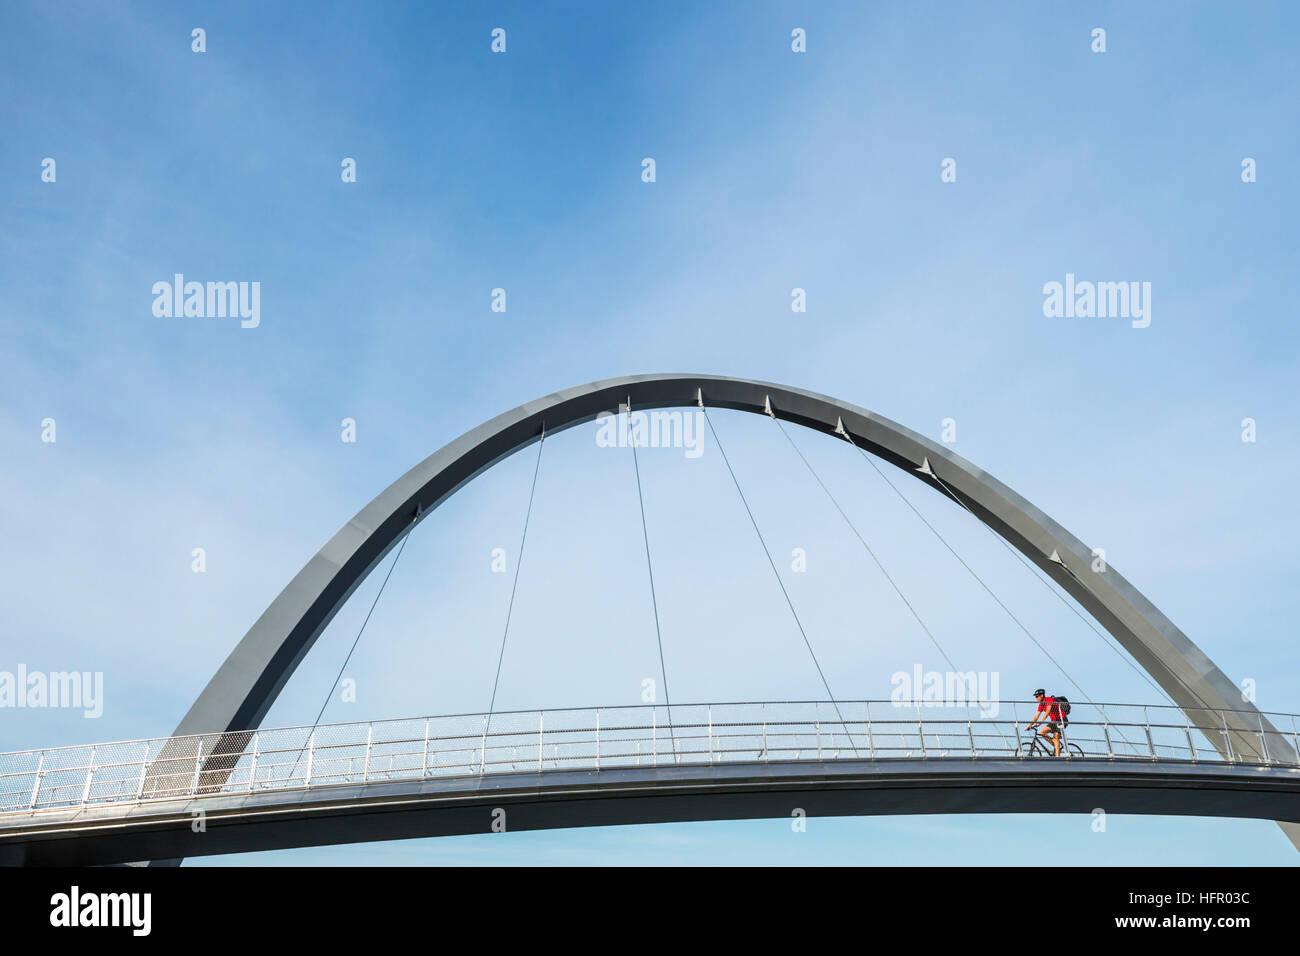 Cyclist crossing the Elizabeth Quay bridge on the Swan River, Perth, Western Australia, Australia - Stock Image